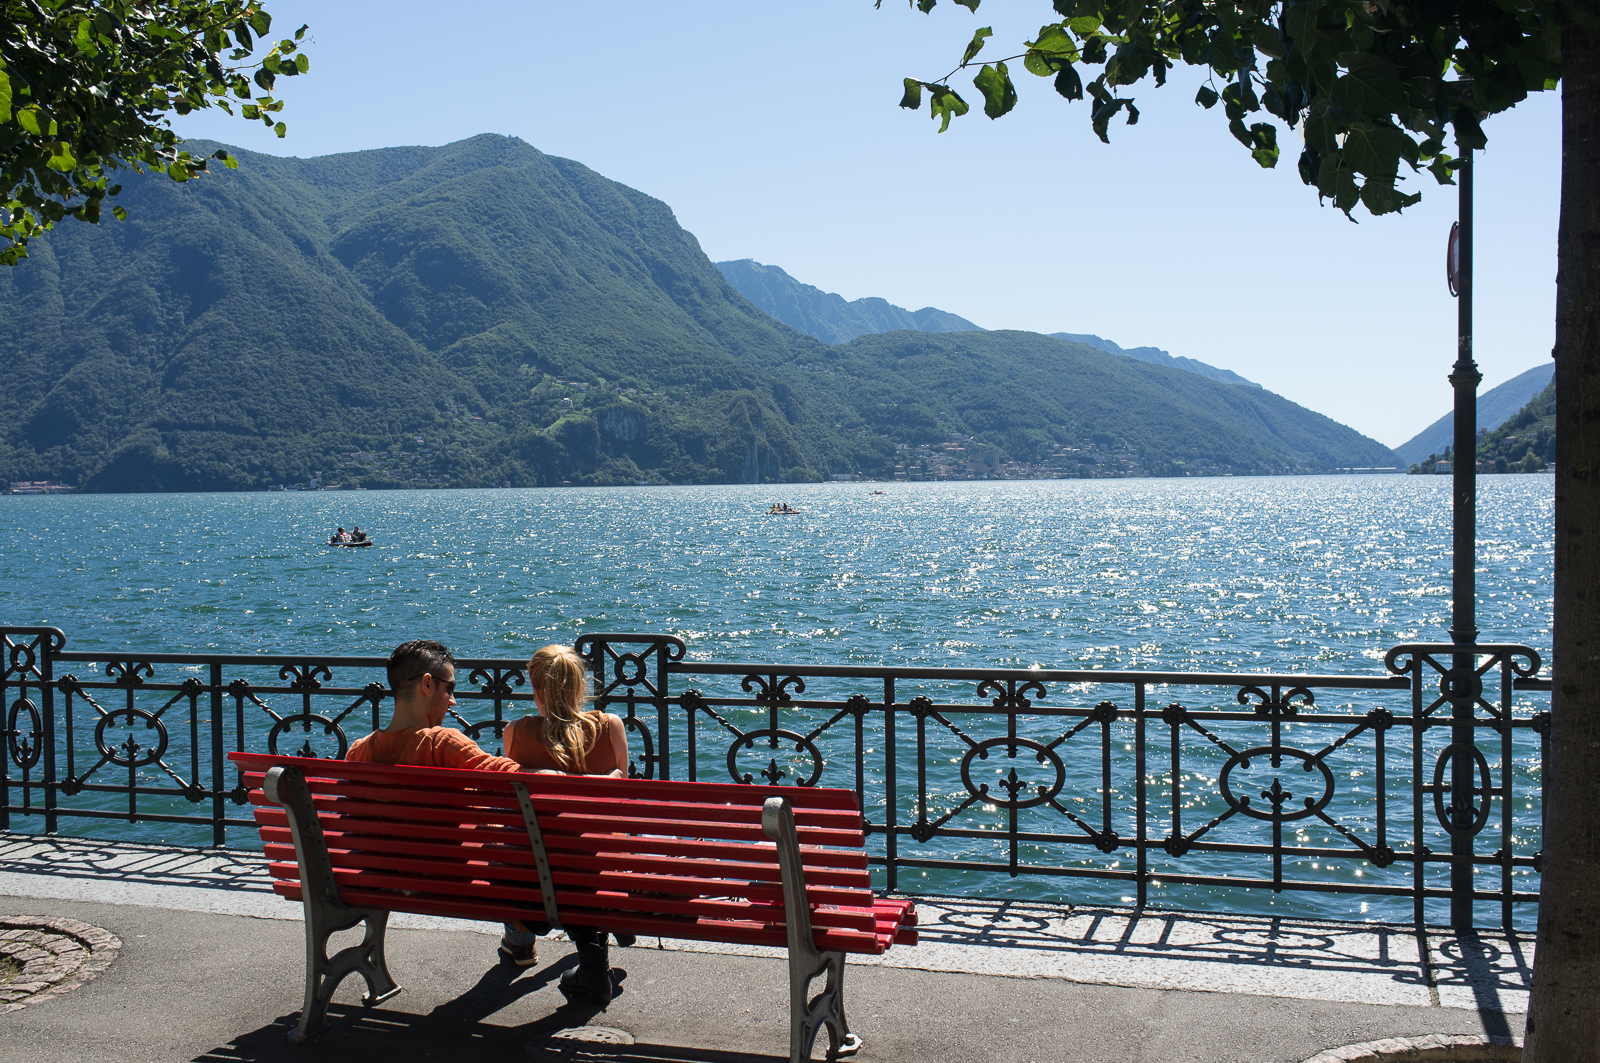 By the Lugano Lake